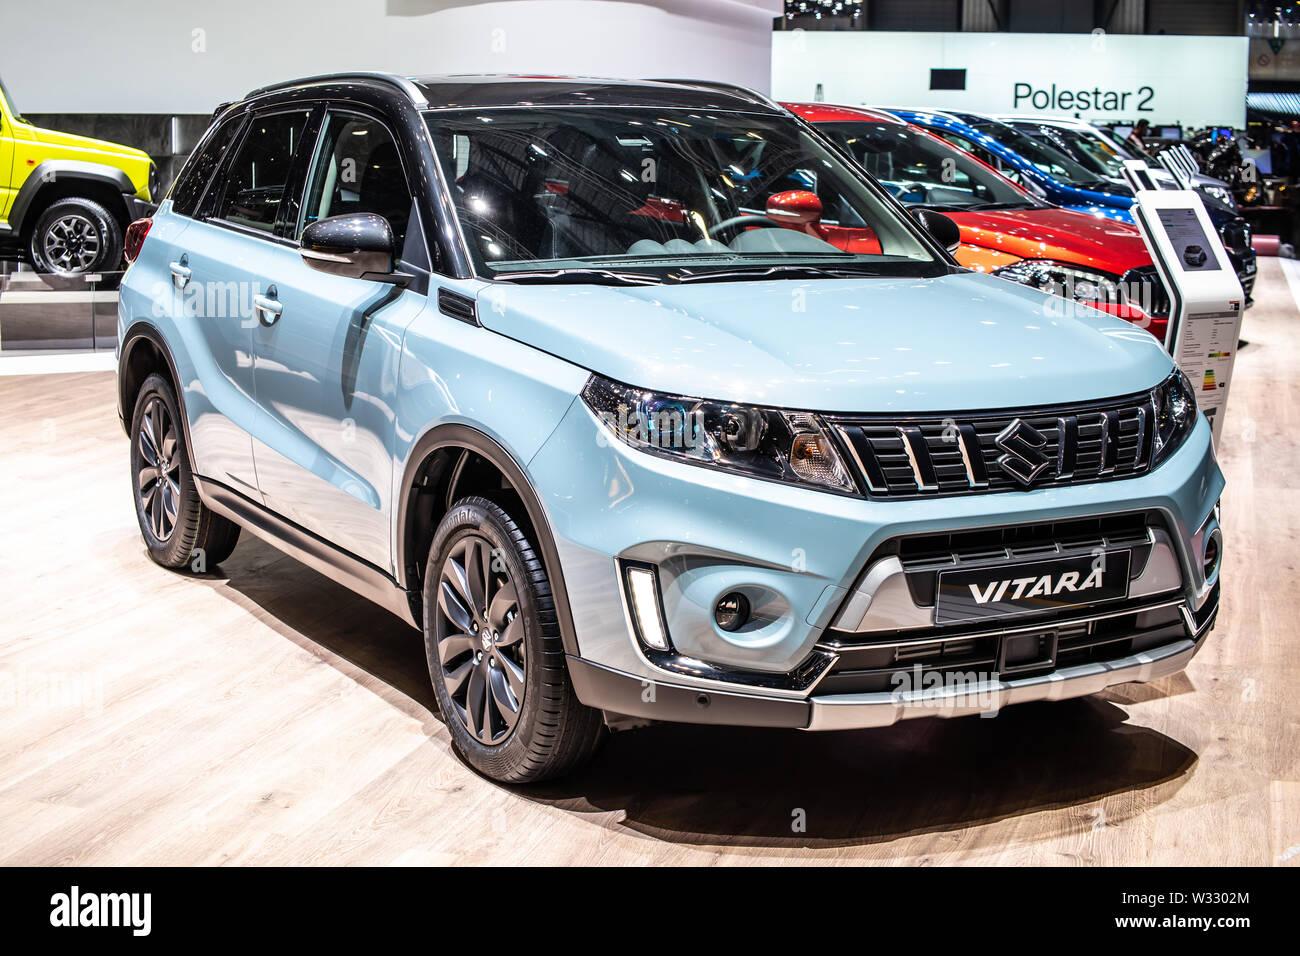 Suzuki Vitara High Resolution Stock Photography And Images Alamy